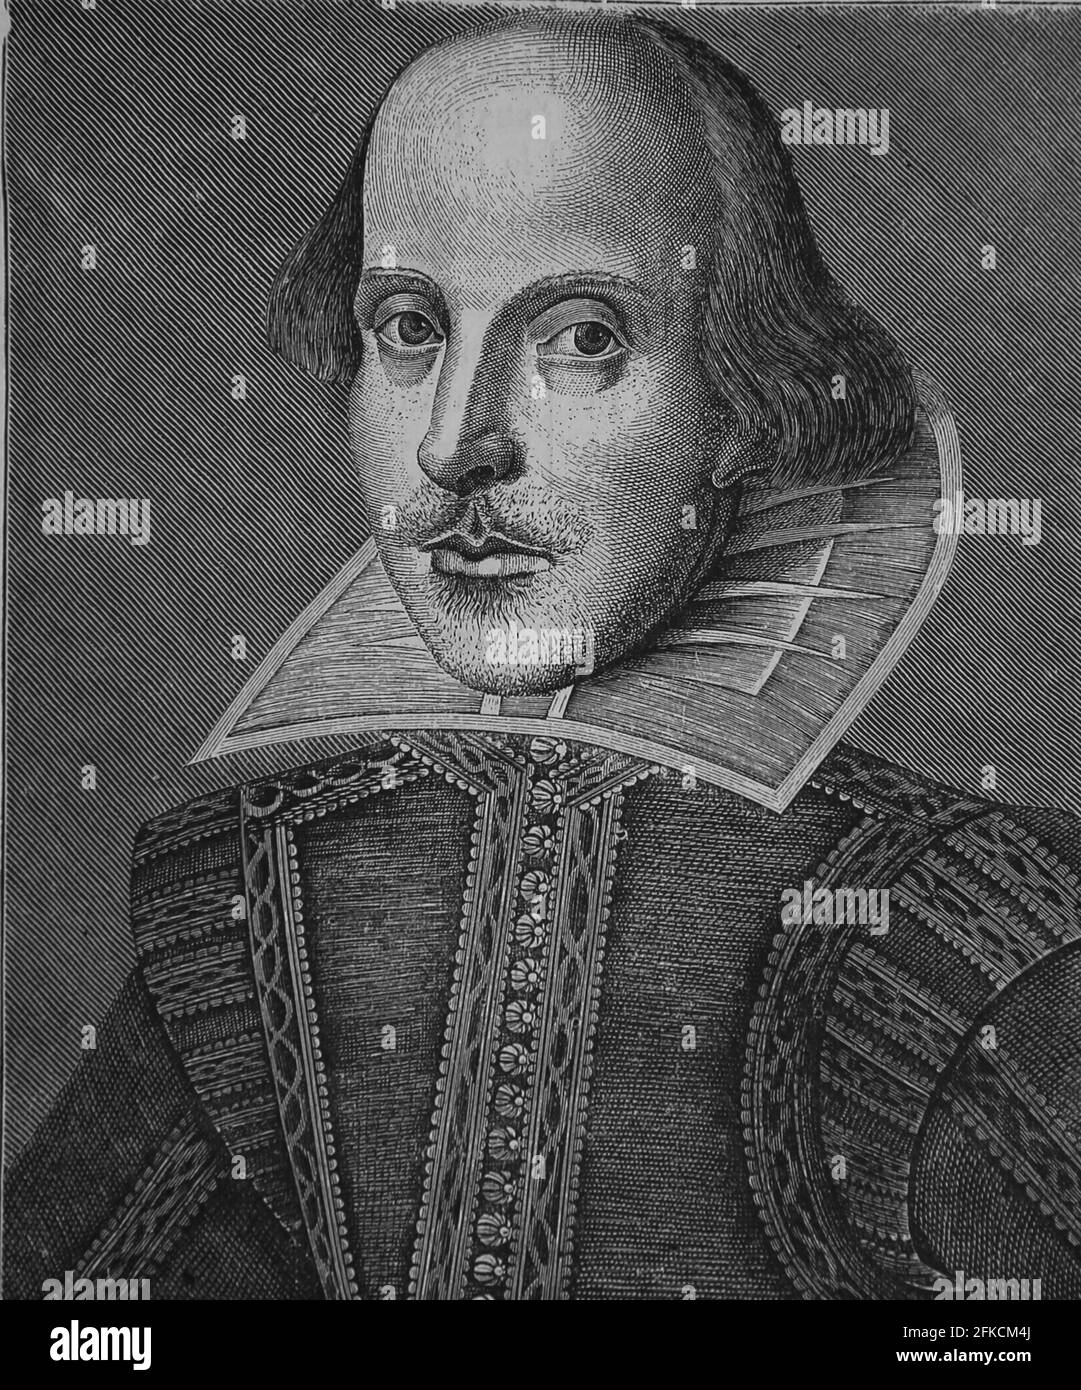 William Shakespeare (1564-1616). Escritor inglés. Facsímile de un grabado de cobre por Martin Drocsbont, 1623. Historia Universal, 1884 Foto de stock